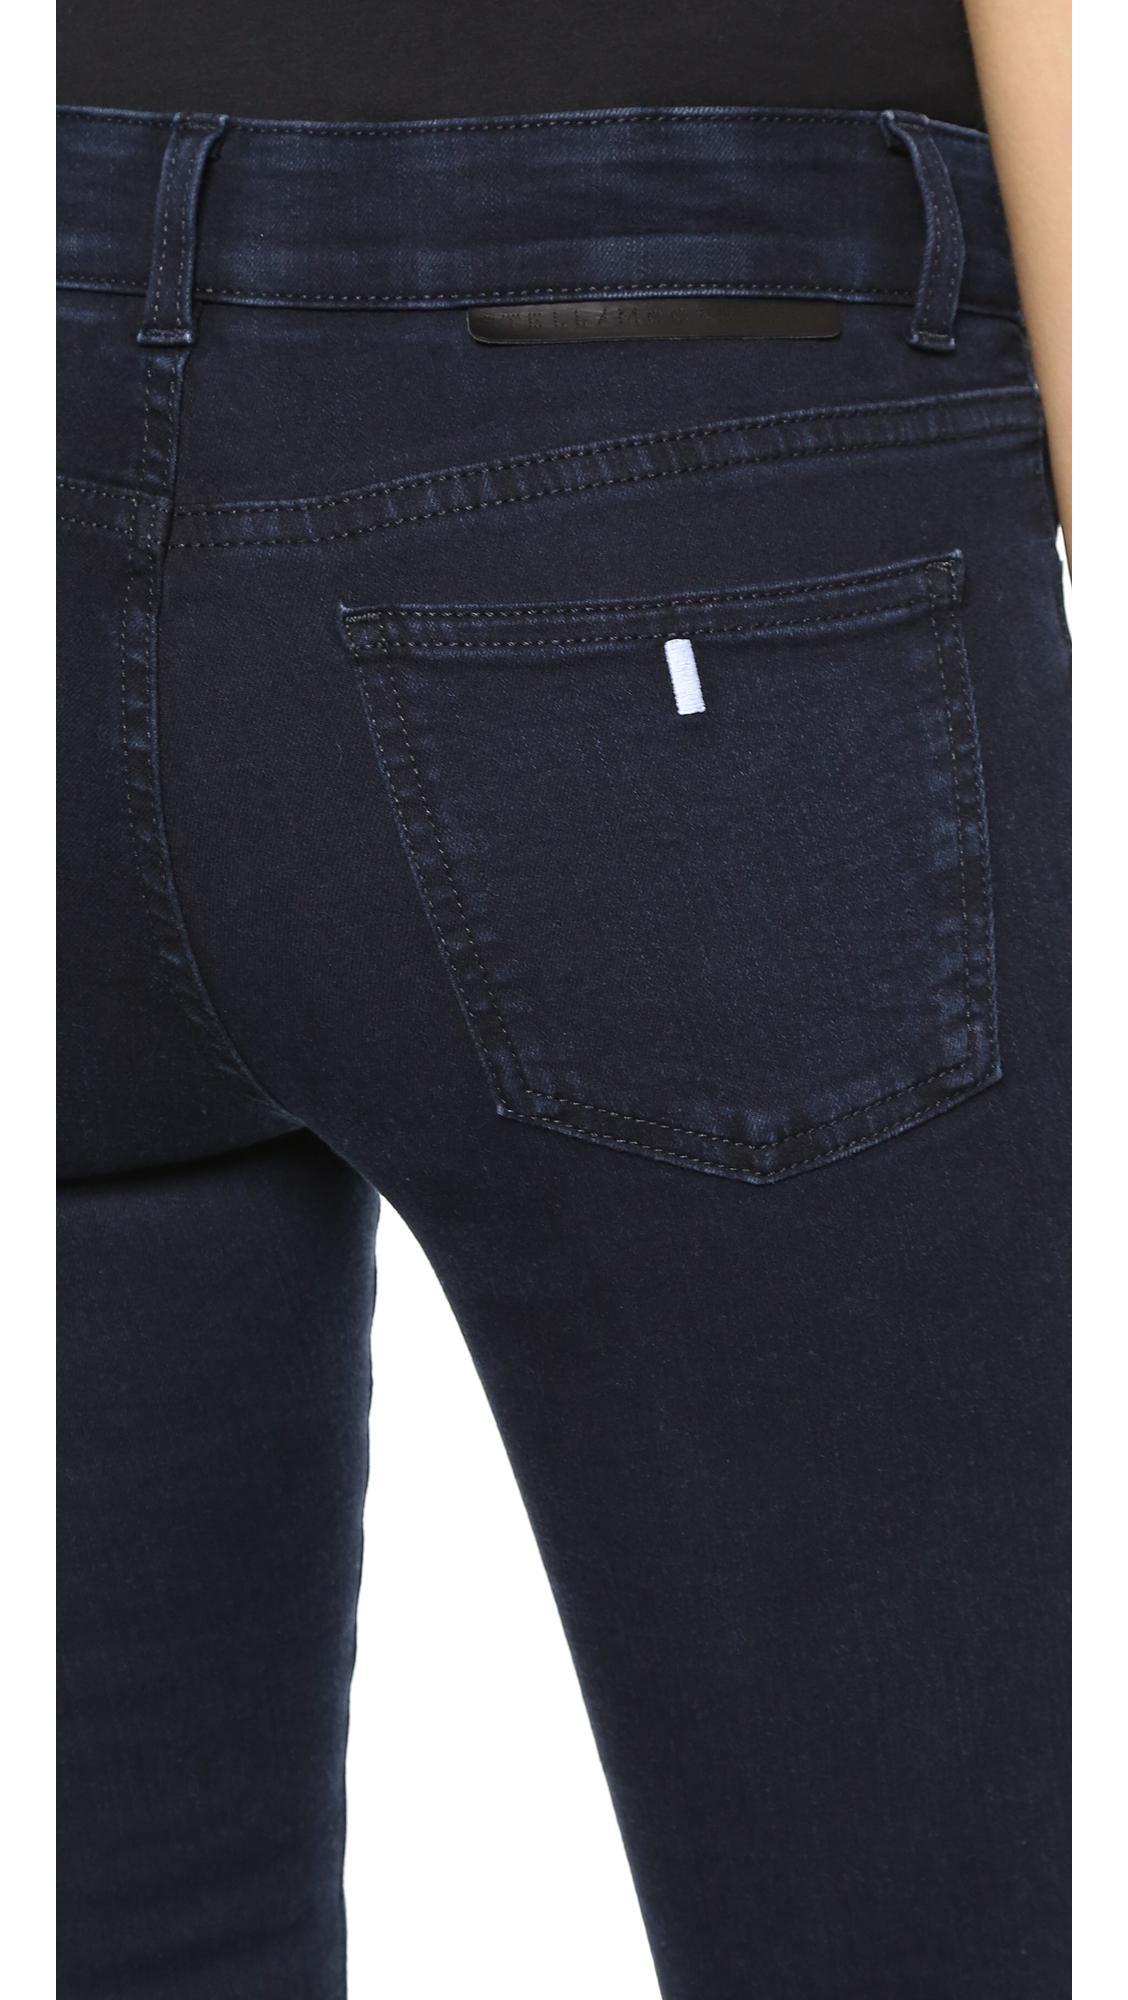 Stella McCartney Denim Long Skinny Jeans in Blue/Black (Black)